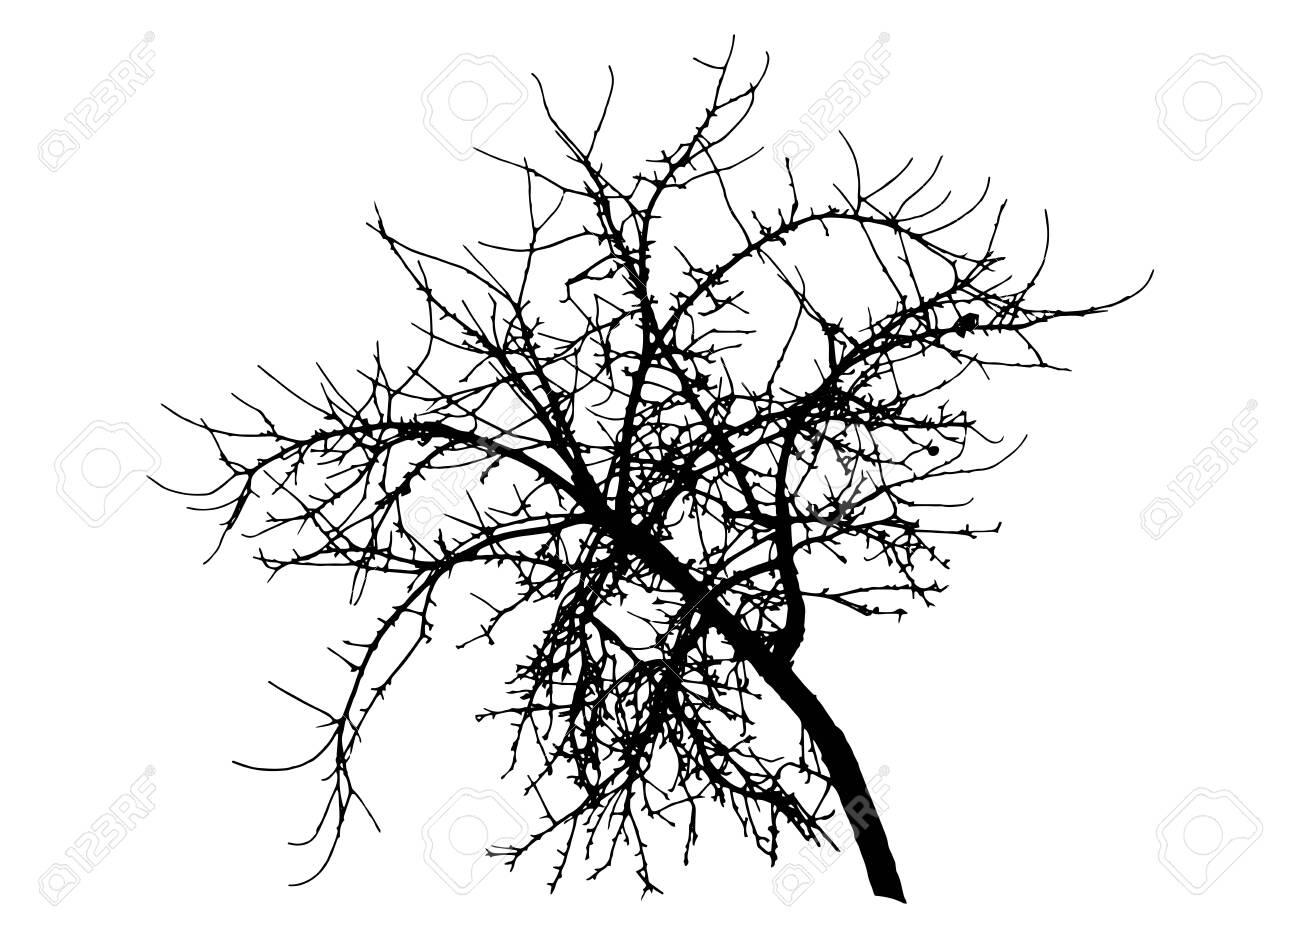 Bare branch apple tree silhouette, vector illustration. - 137361838